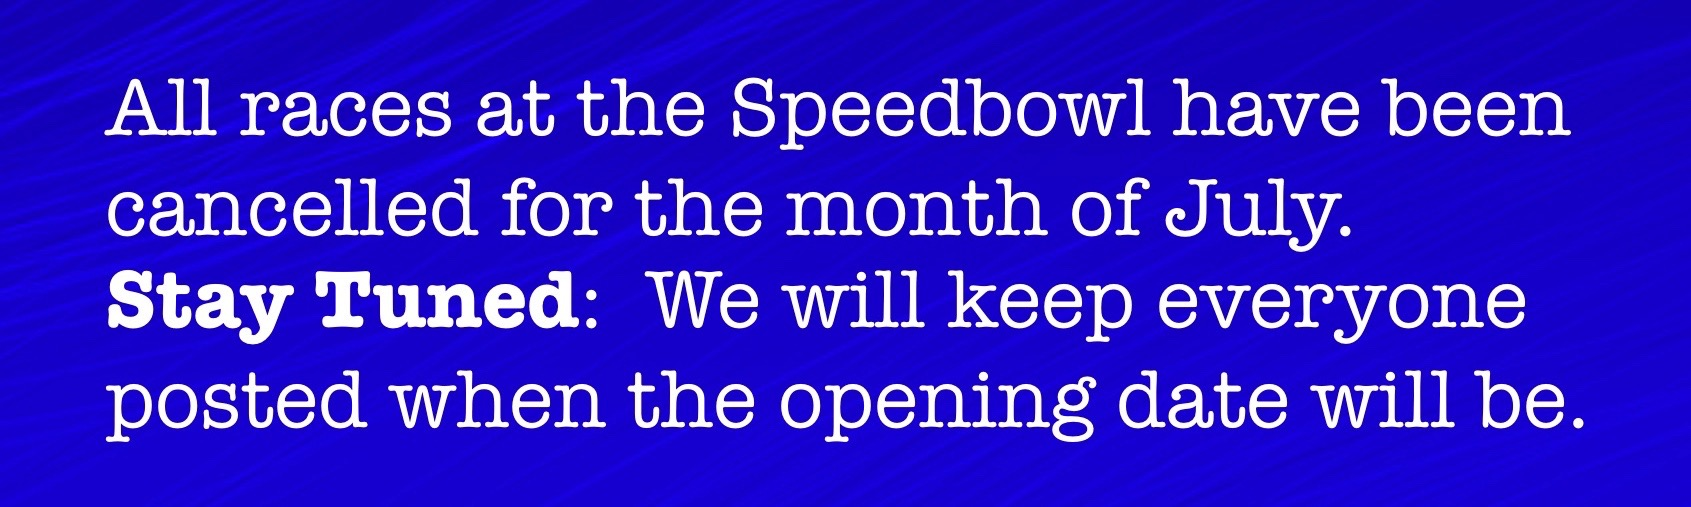 Waterford Speedbowl